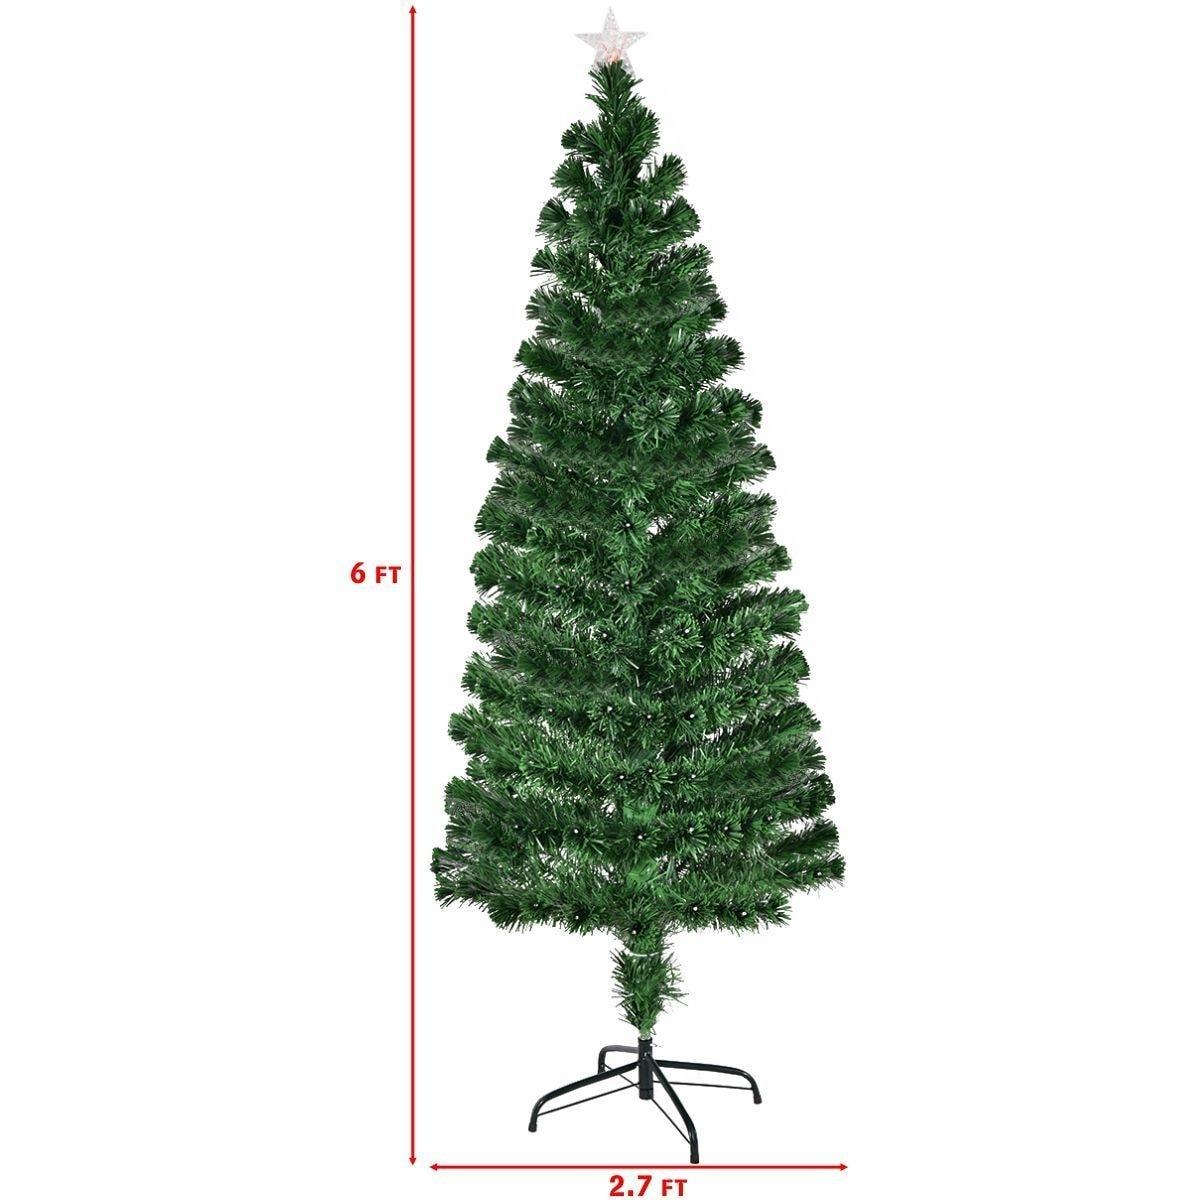 Shop Costway 6Ft Fiber Optic Artificial Christmas Tree w/225 Multi ...